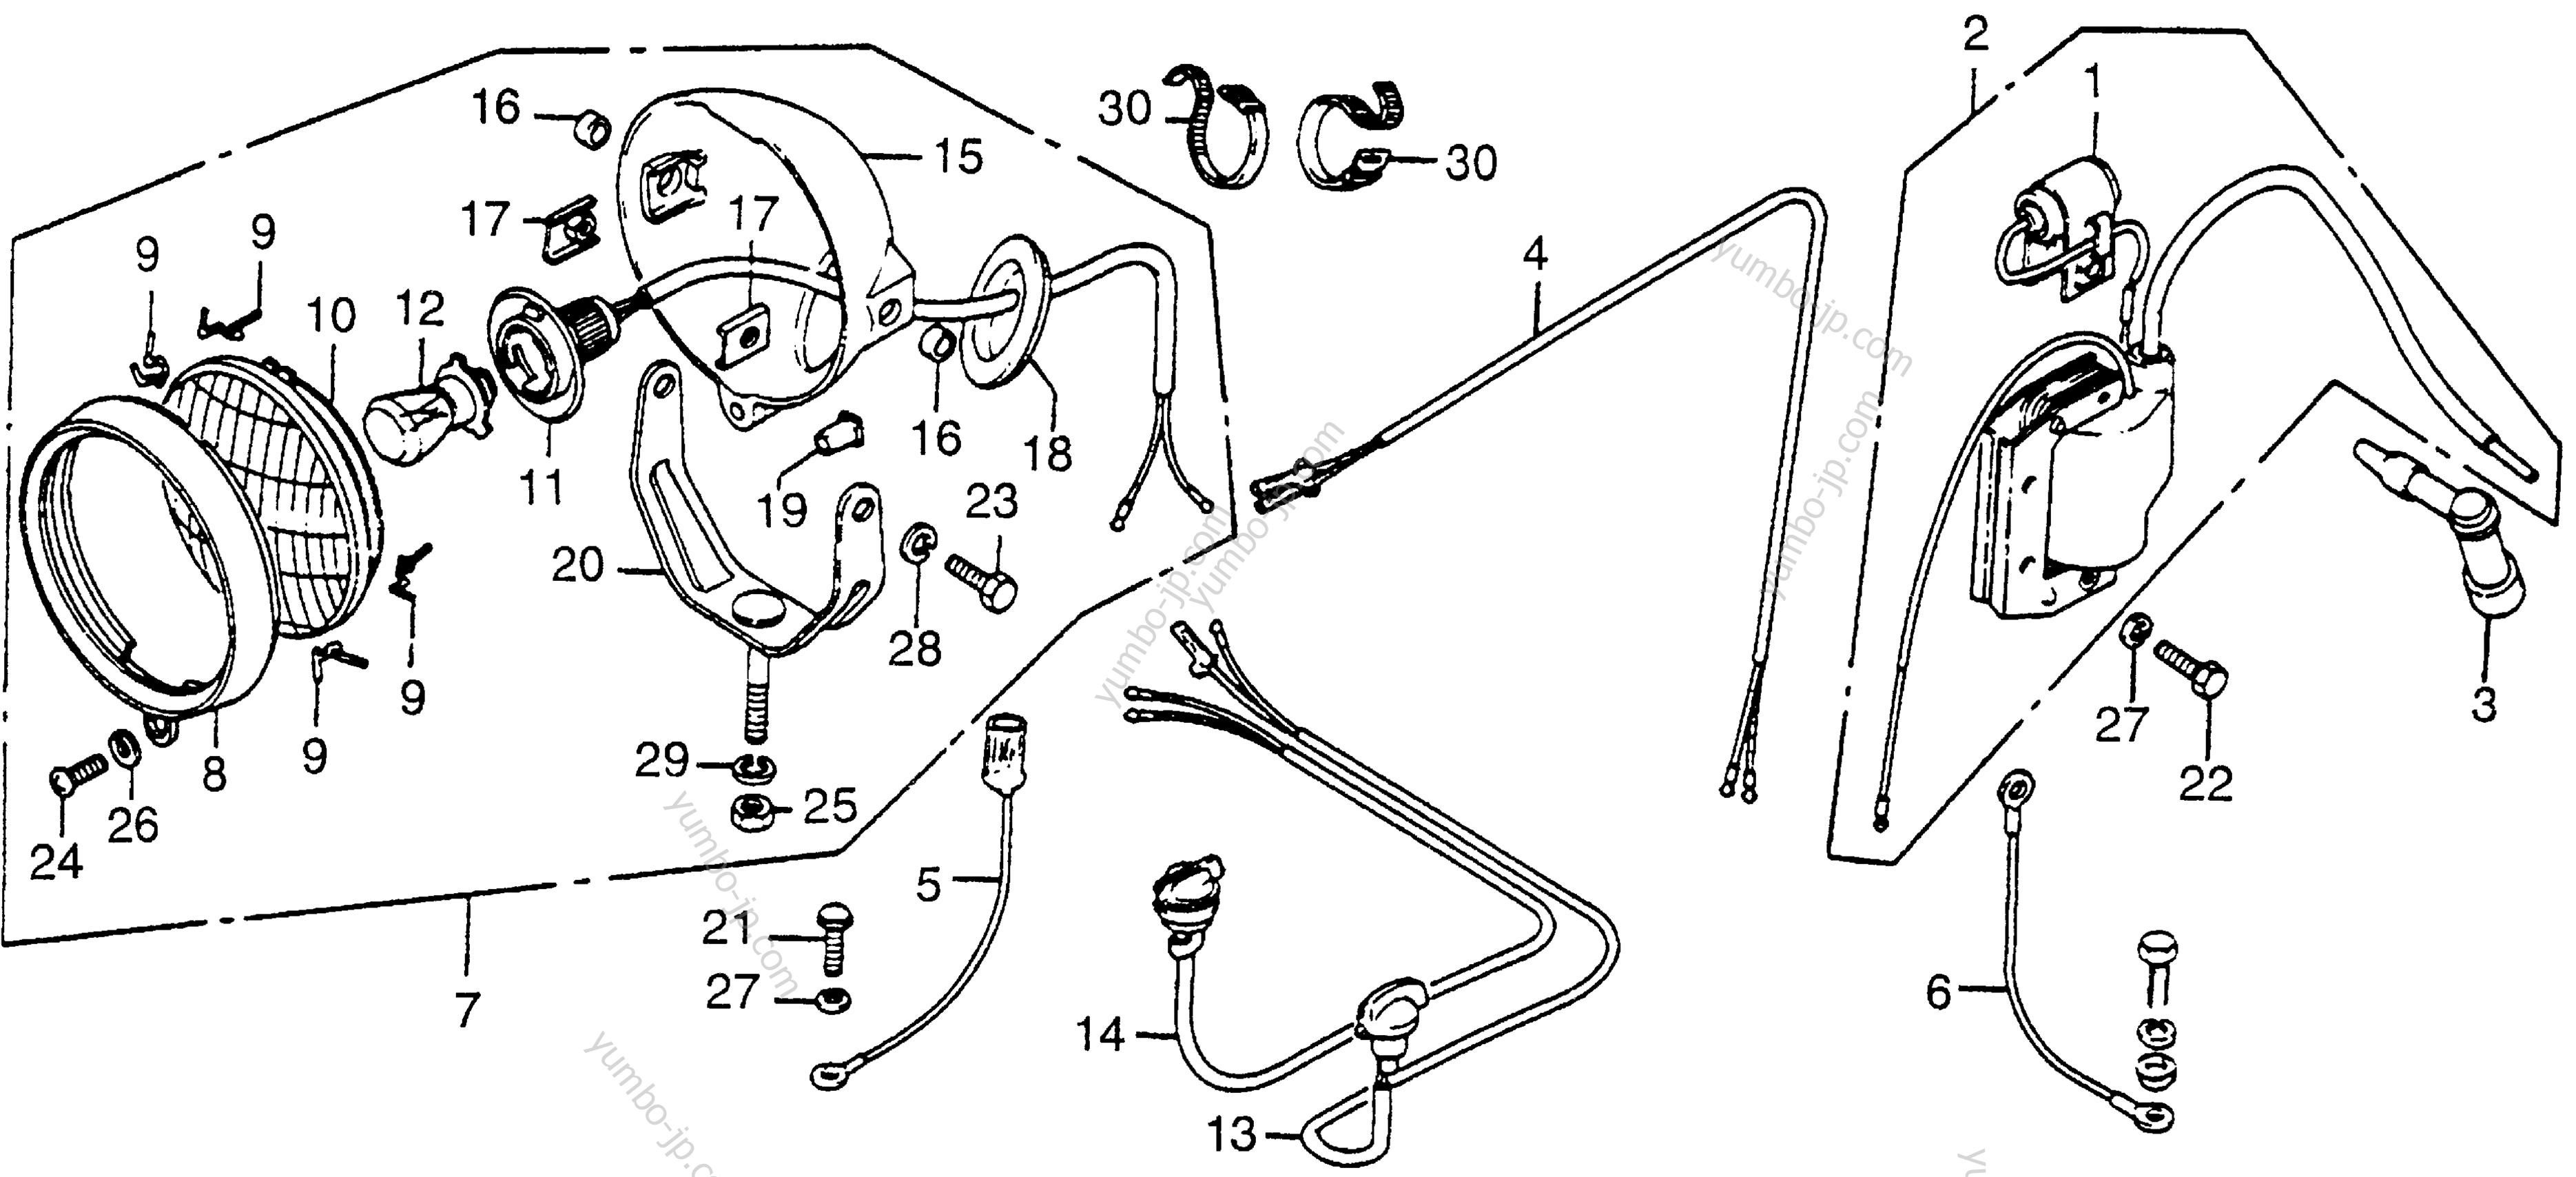 Wiring Diagram 1984 Honda Fl250 Odyssey Gas Tank Simple Site Harness Explained